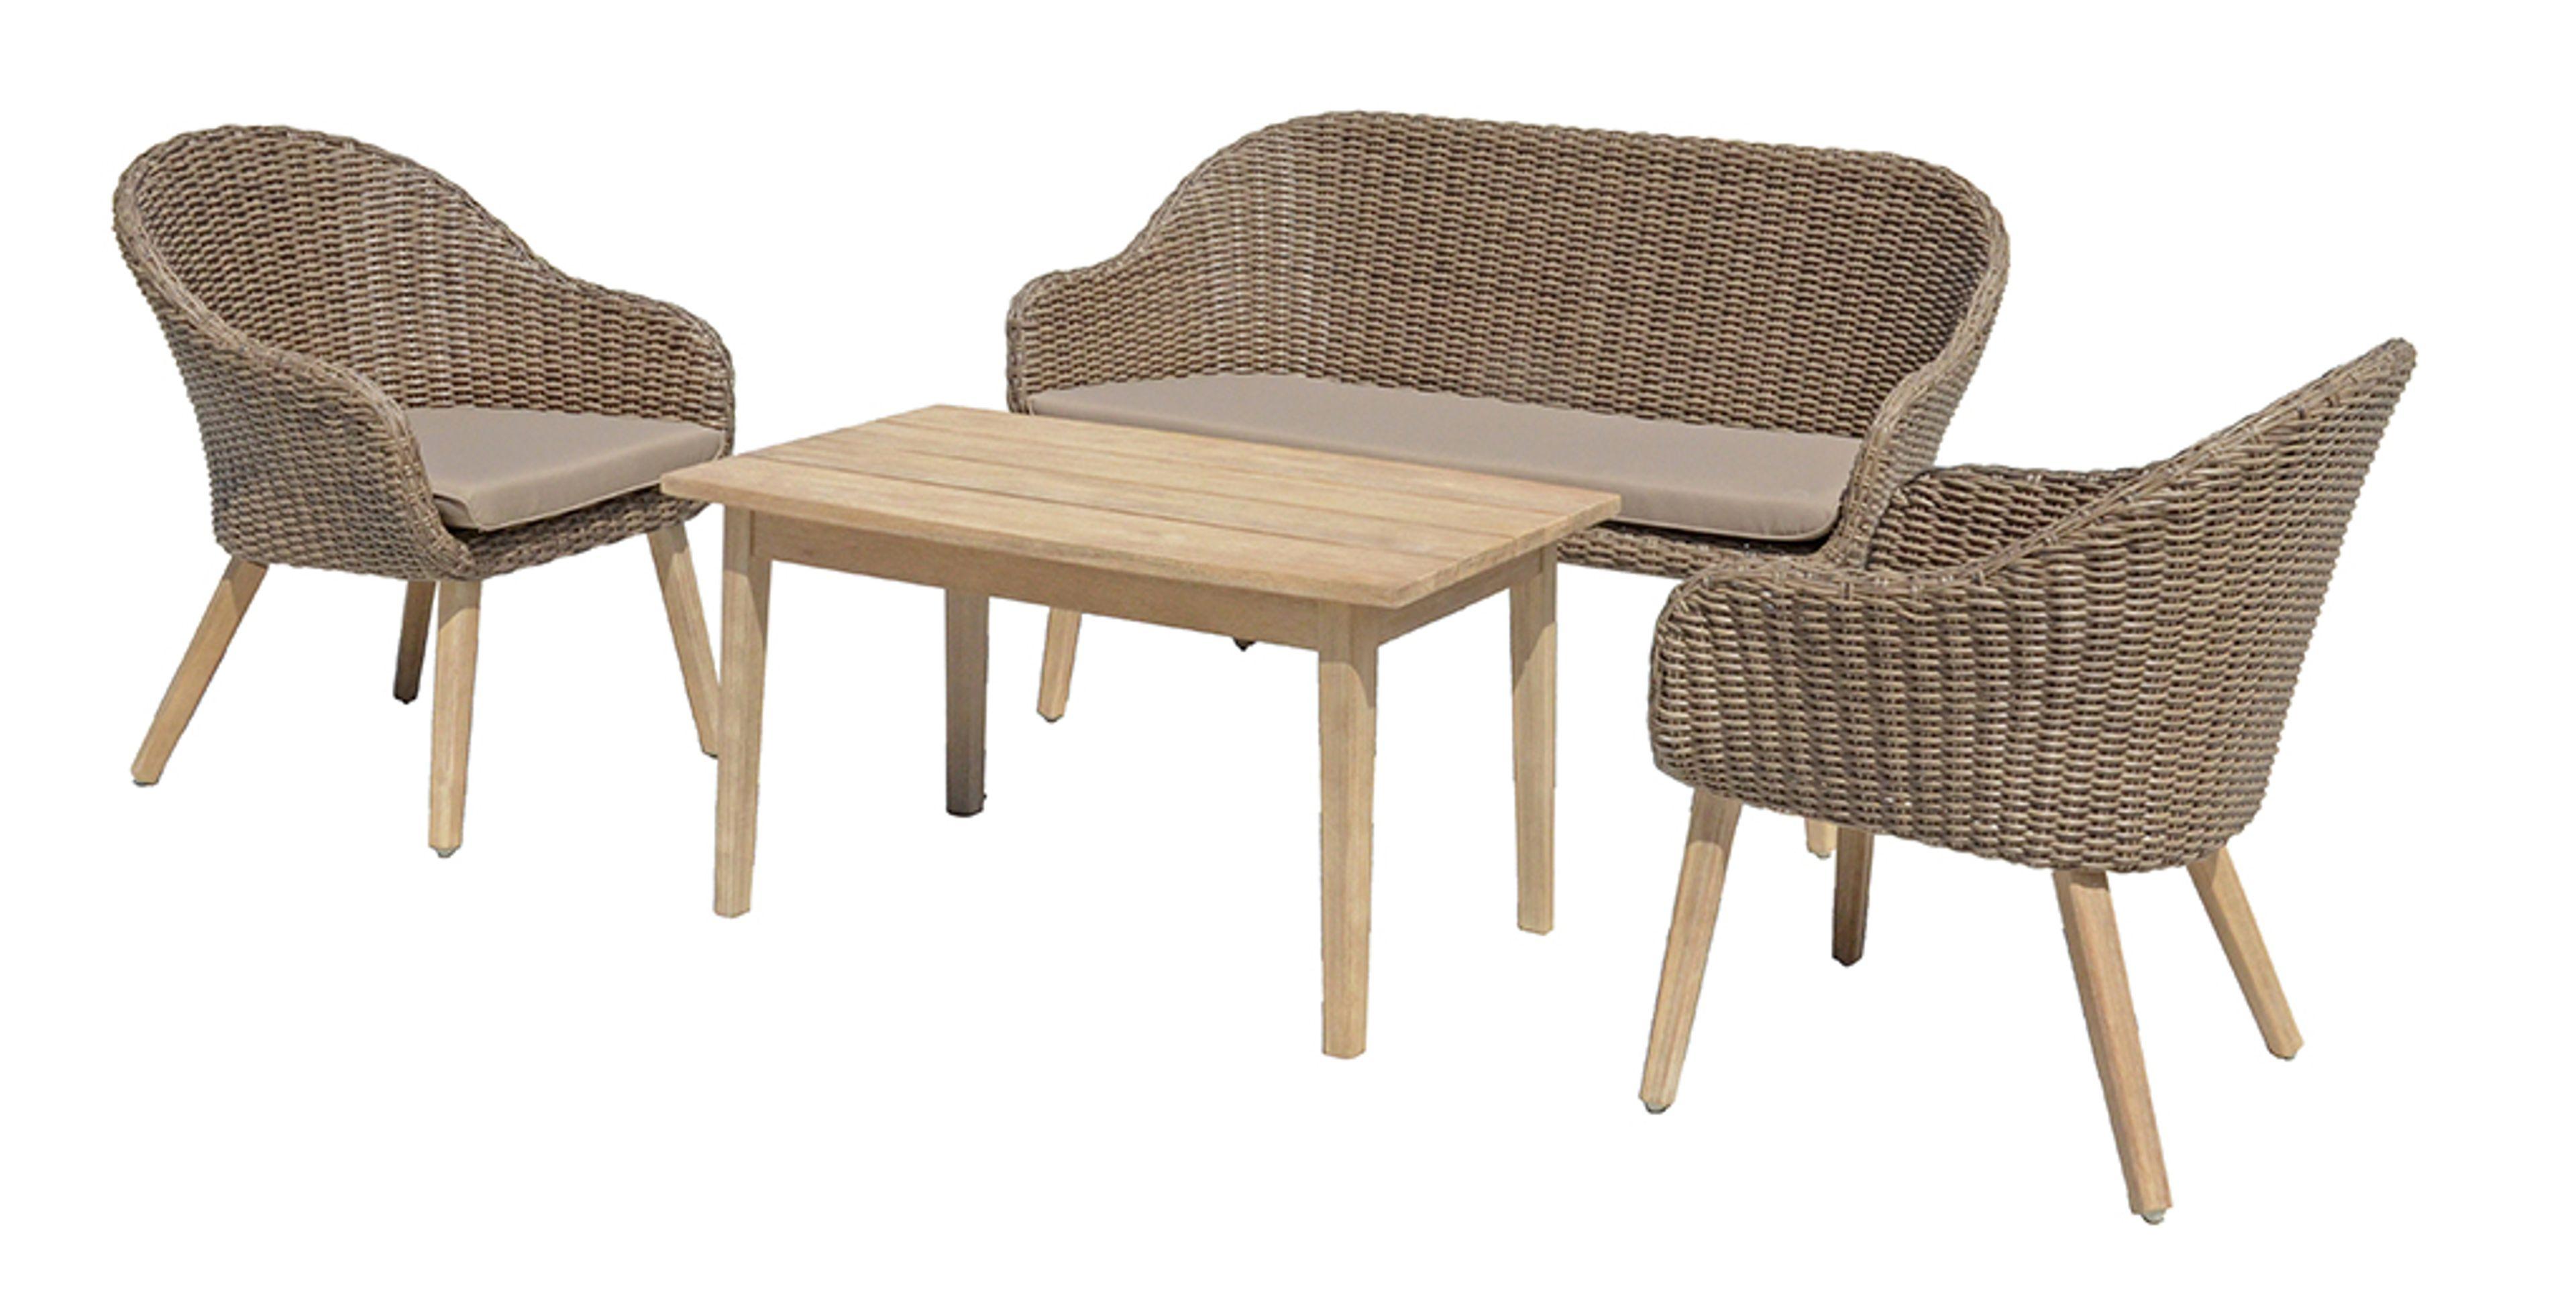 4 Tlg Lounge Gruppe Gartengarnitur Sitzgruppe Sitzecke Bank Sofa